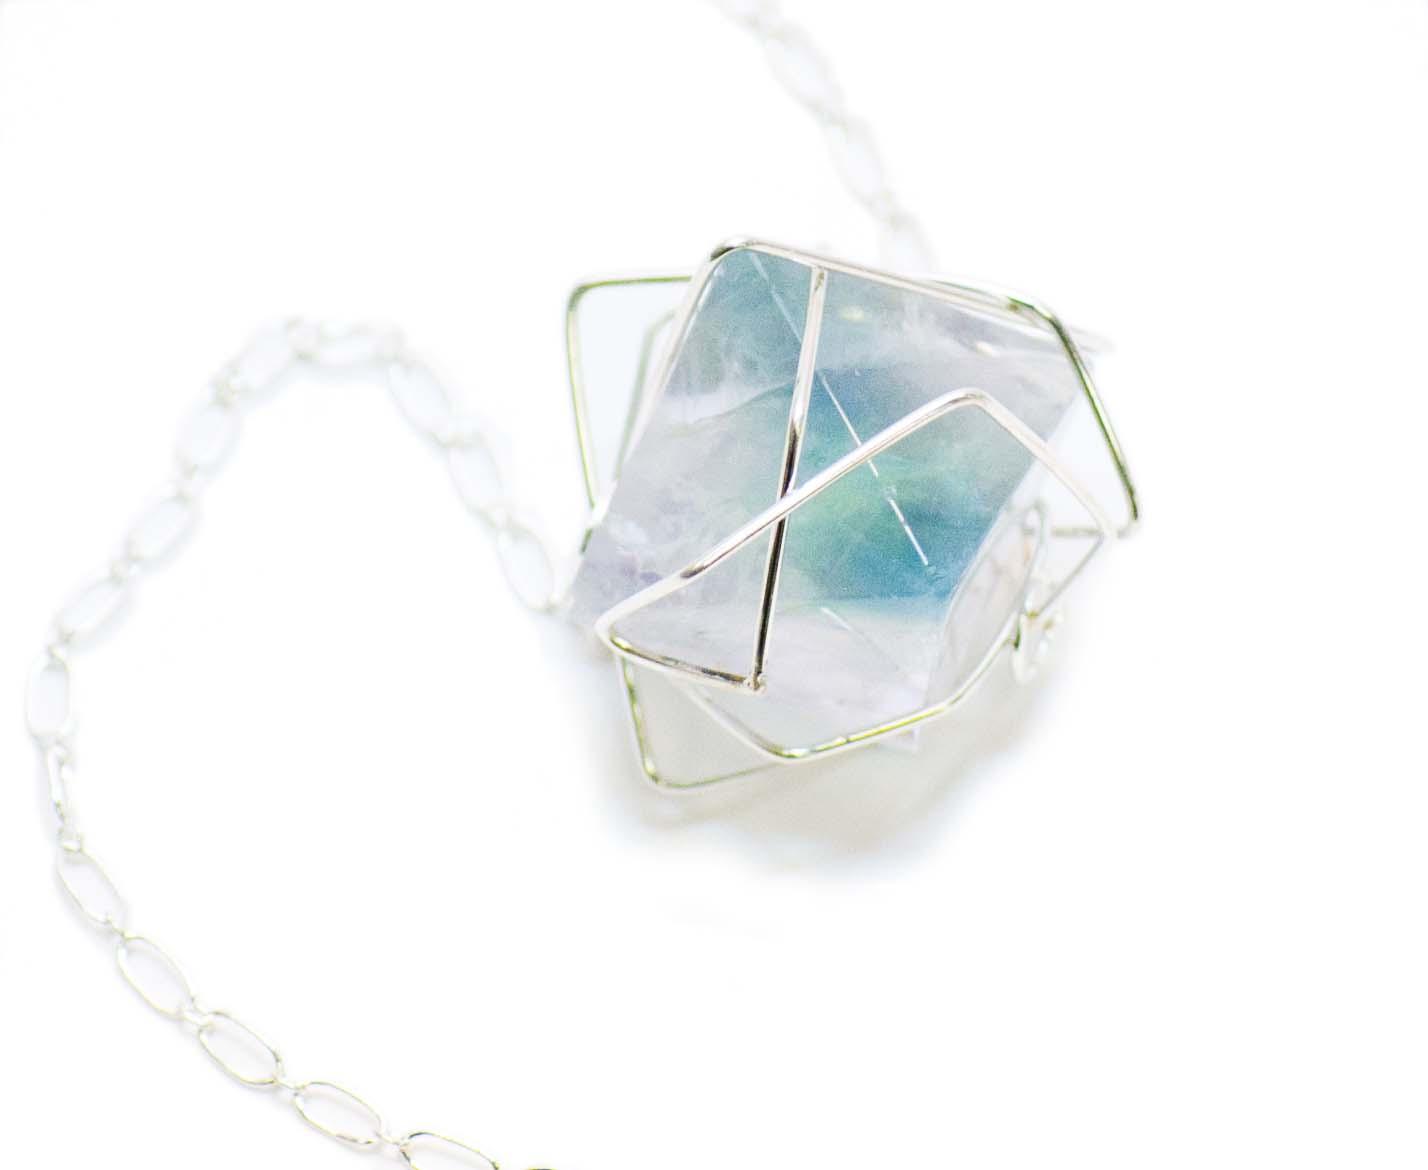 Fluorite octohedron pendent